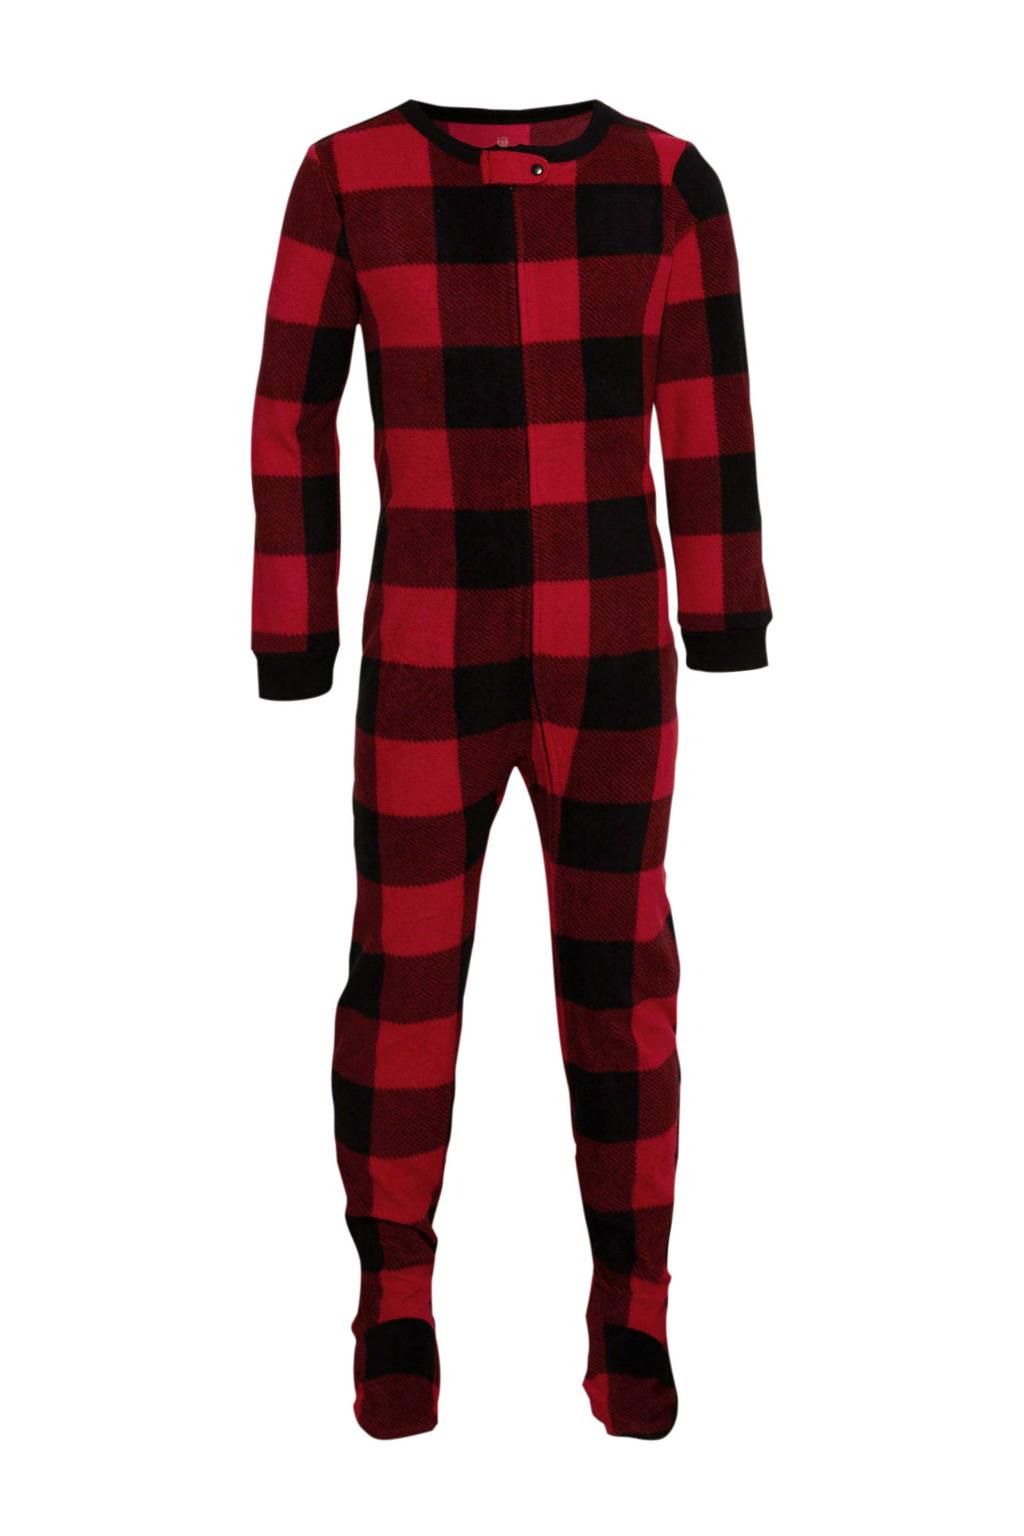 GAP   pyjama one piece rood/zwart, Rood/zwart